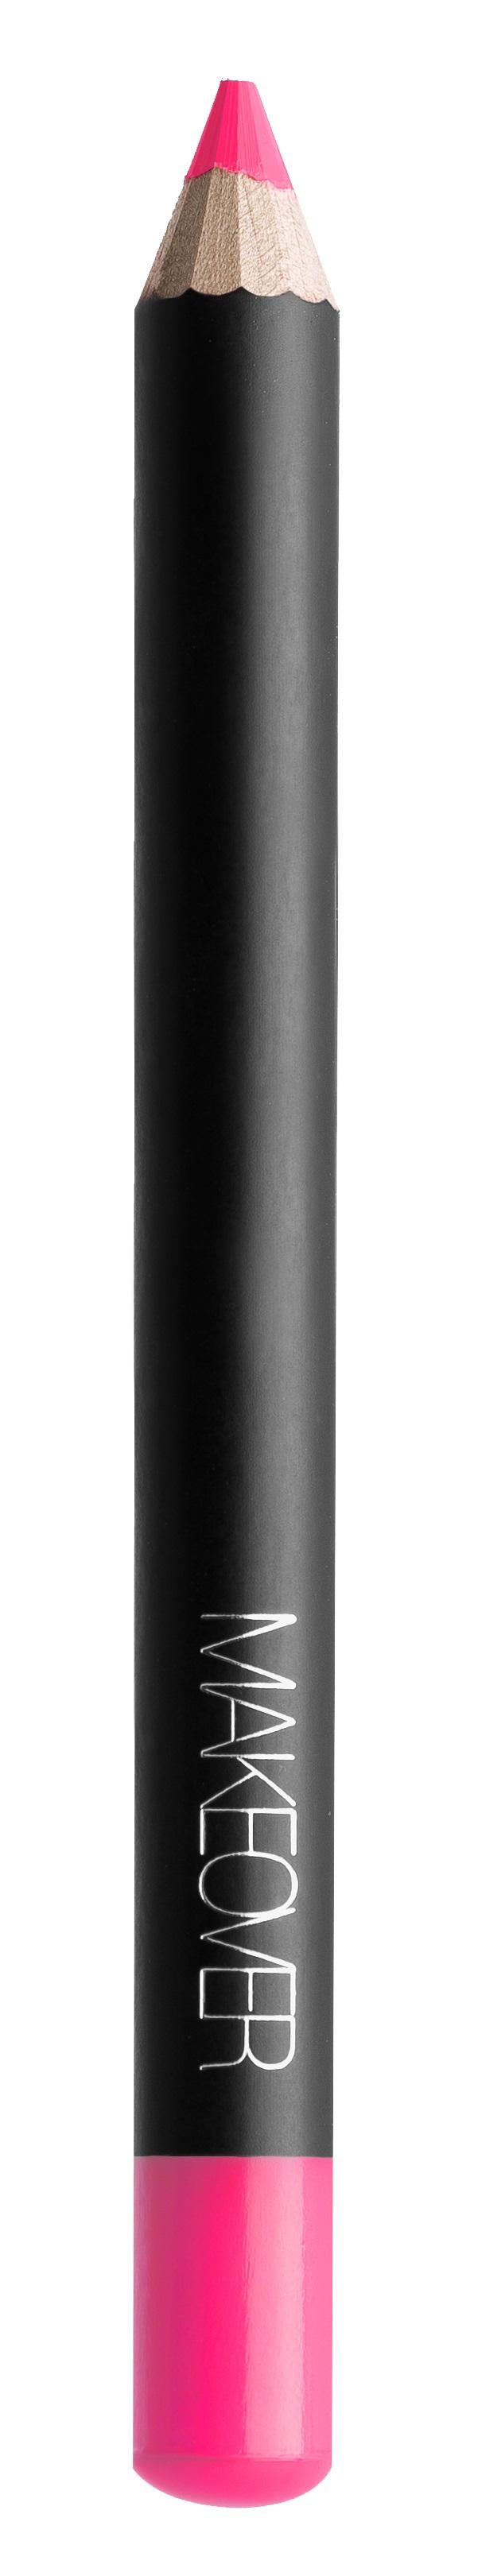 Купить Помада-карандаш MAKEOVER PARIS ART STICK L0511 Pink Pigeon